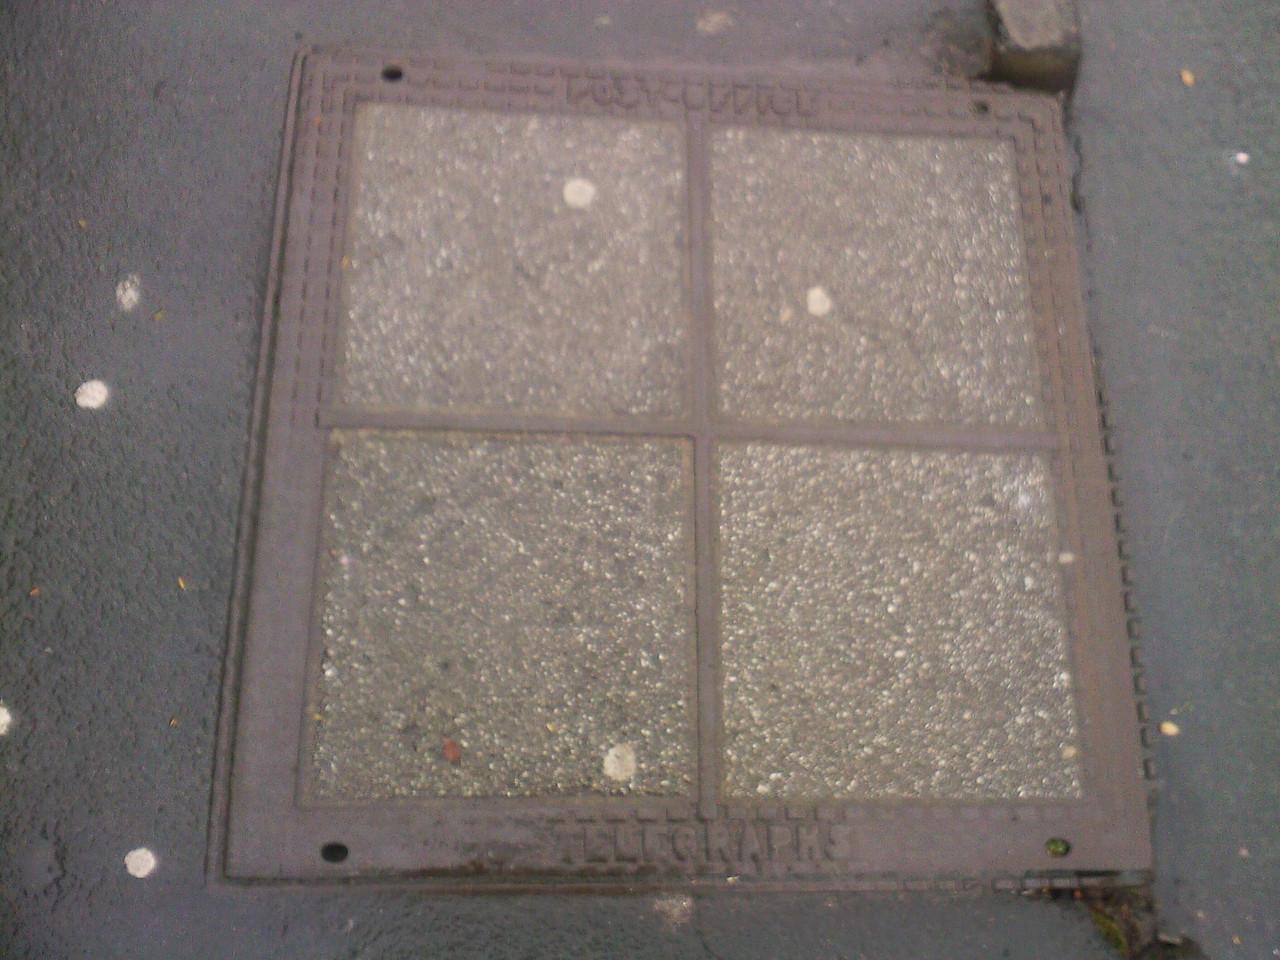 Post Office Telegrams, manhole cover